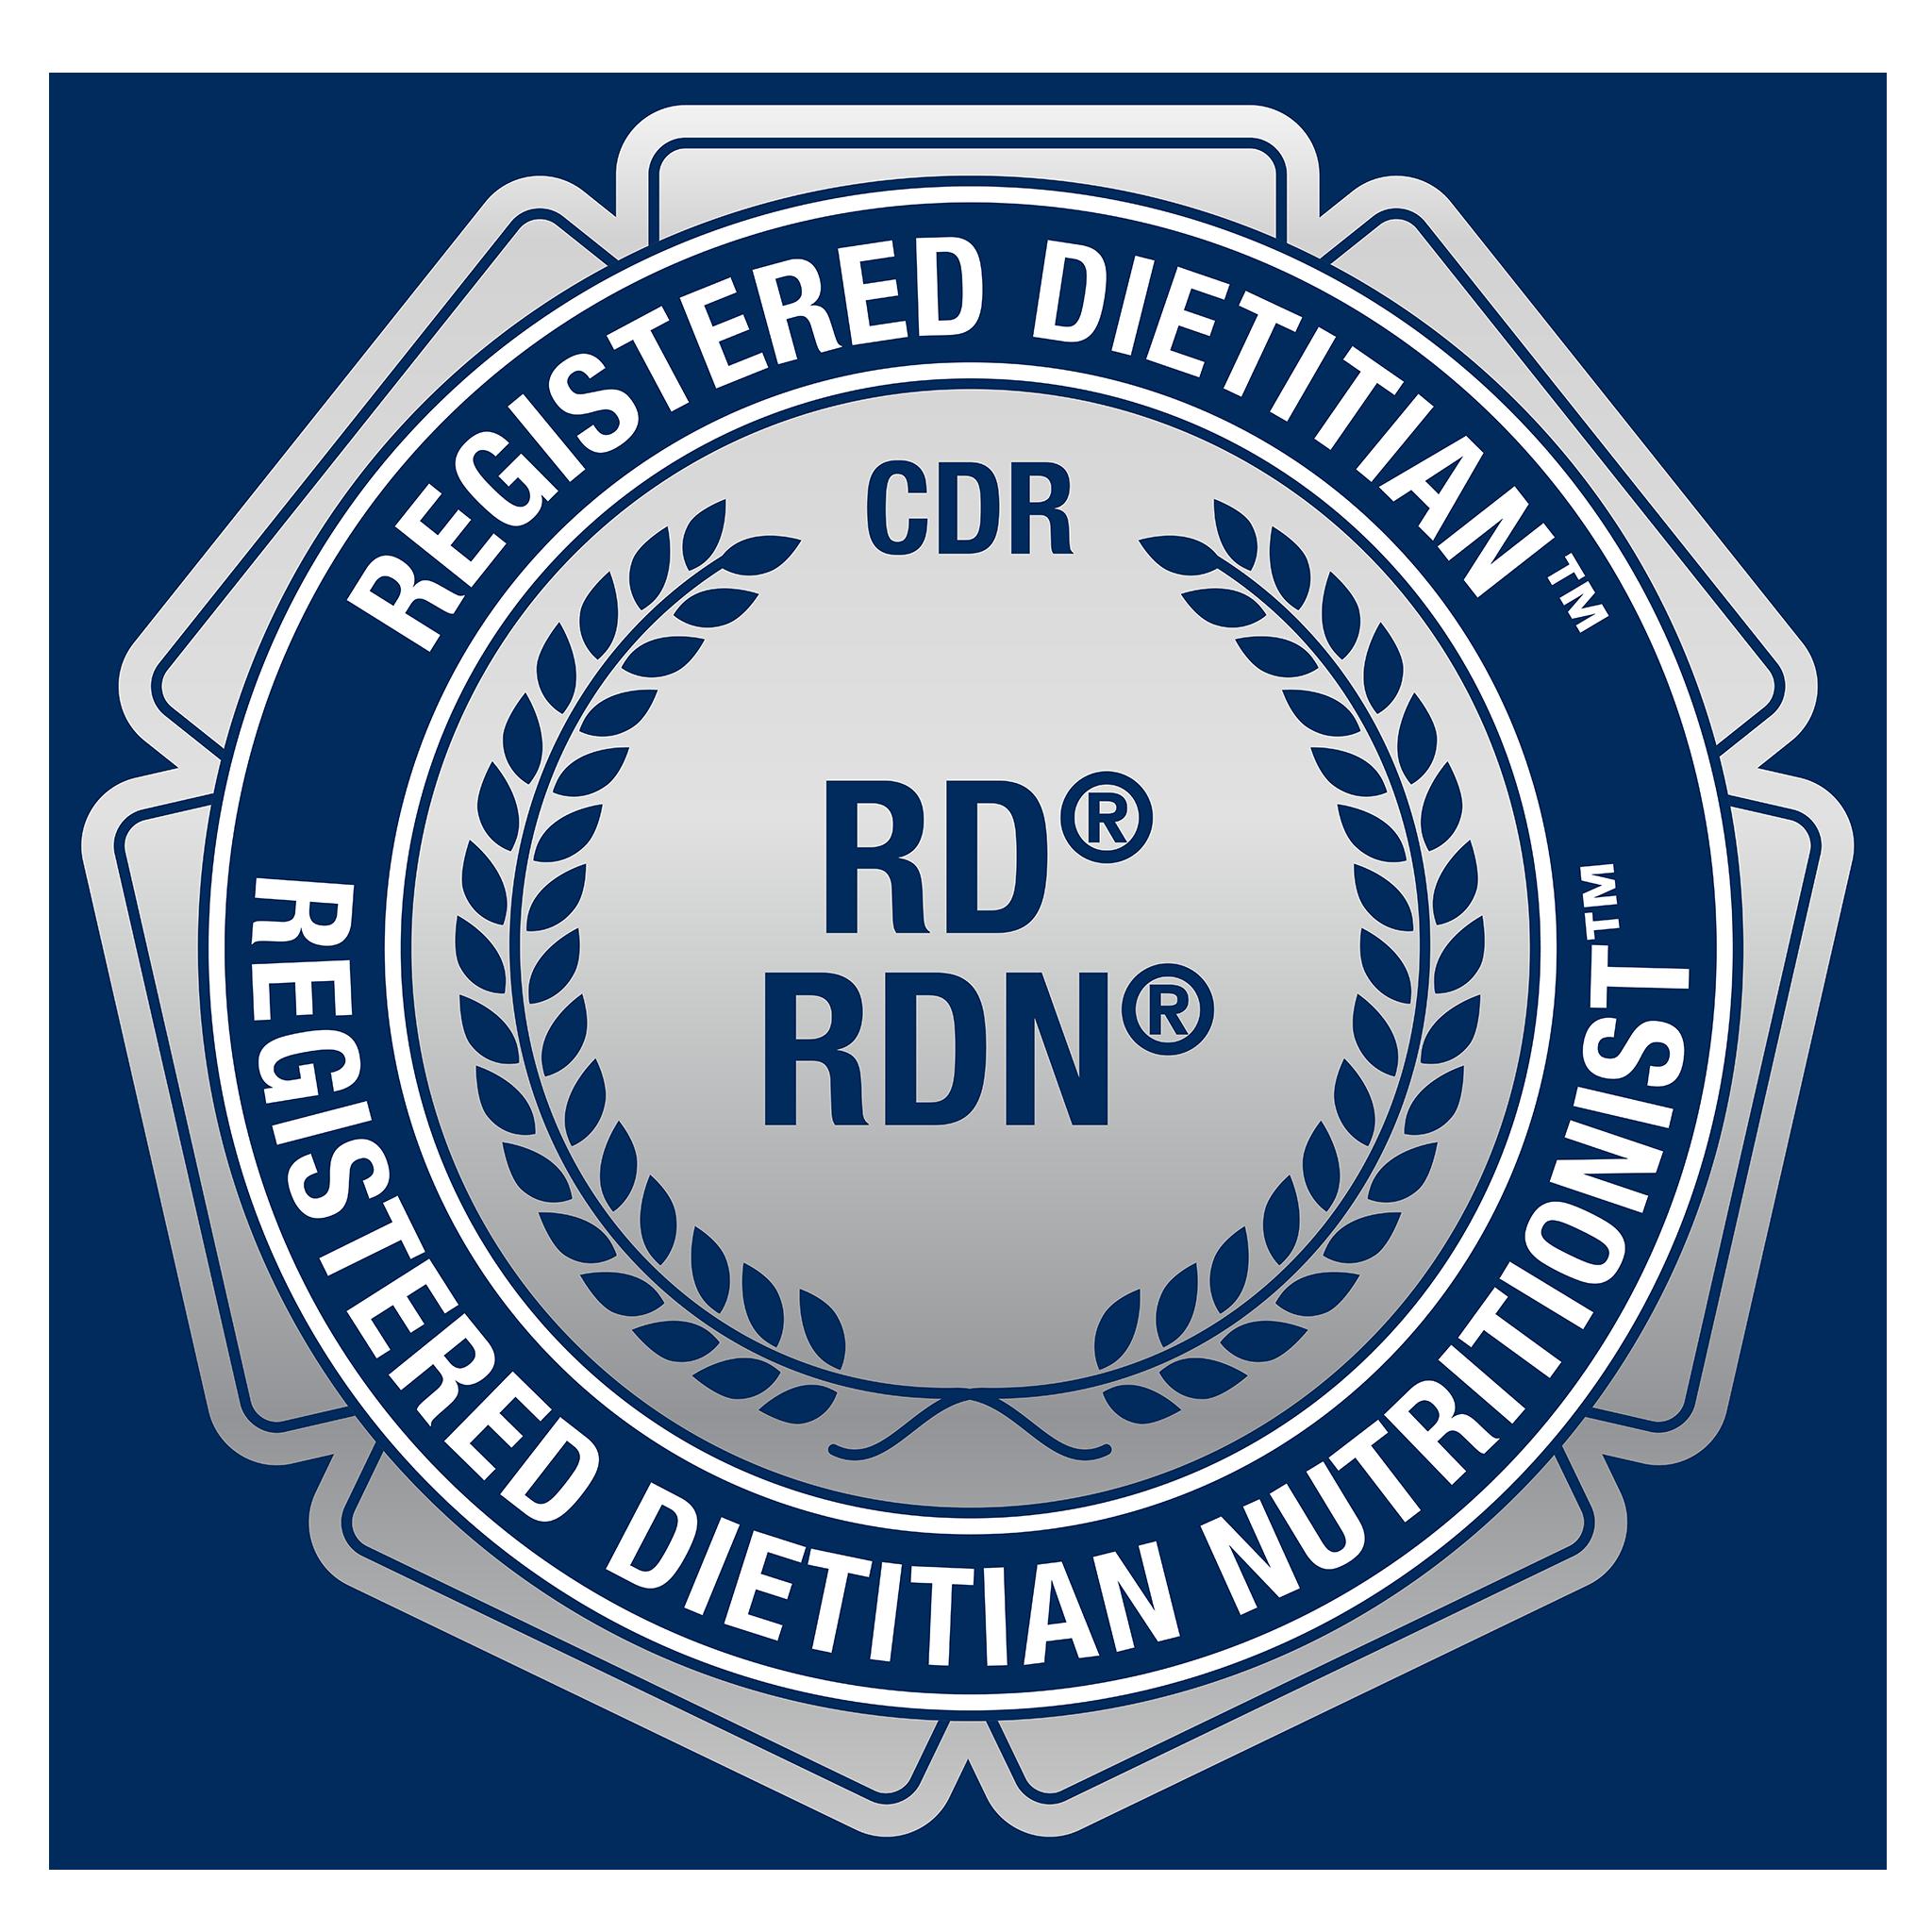 Registered Dietitian (RD) or Registered Dietitian Nutritionist (RDN)